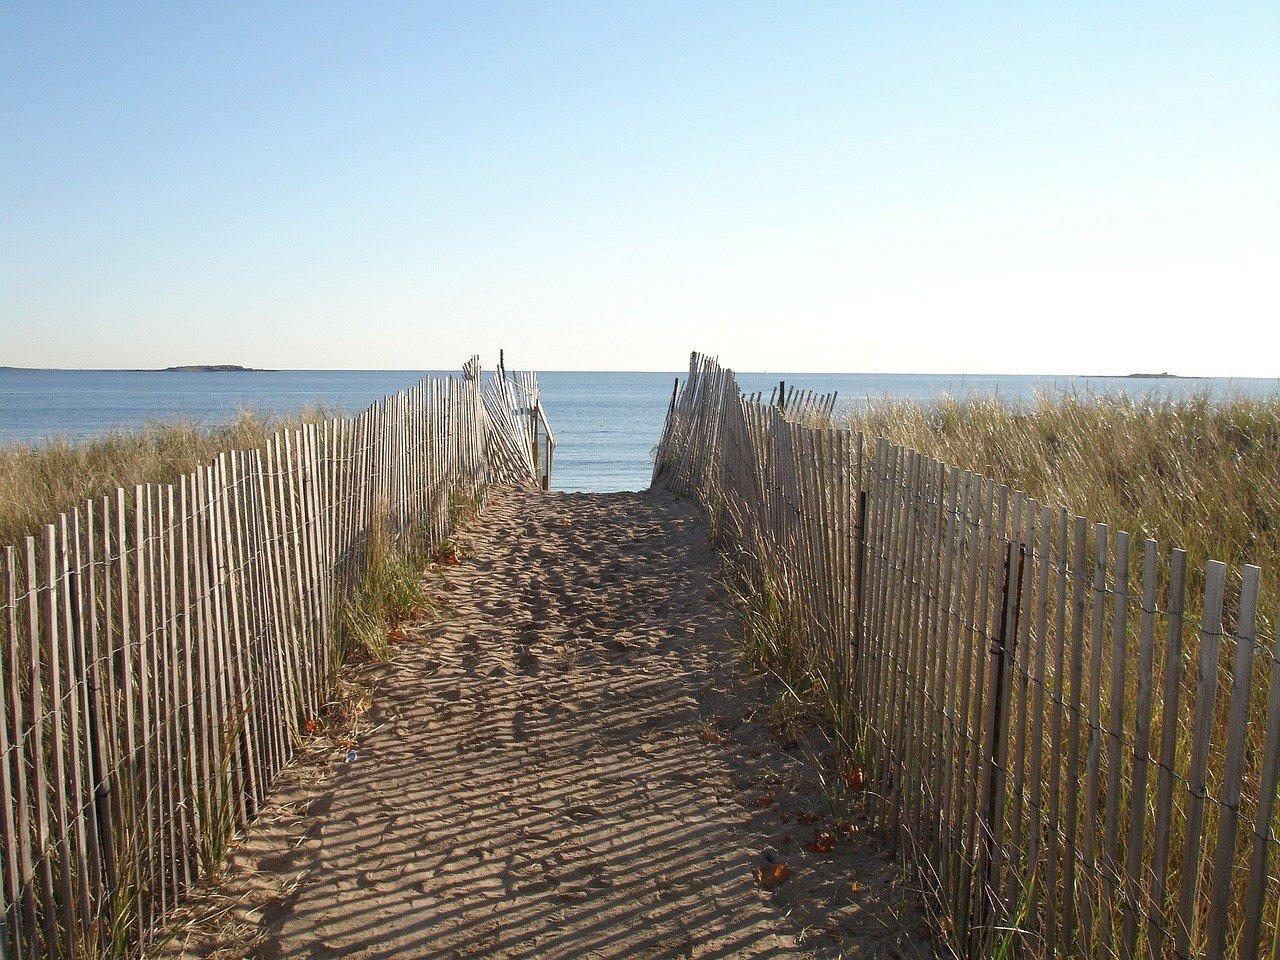 cap cod beach and fences romantic new england coast road trip